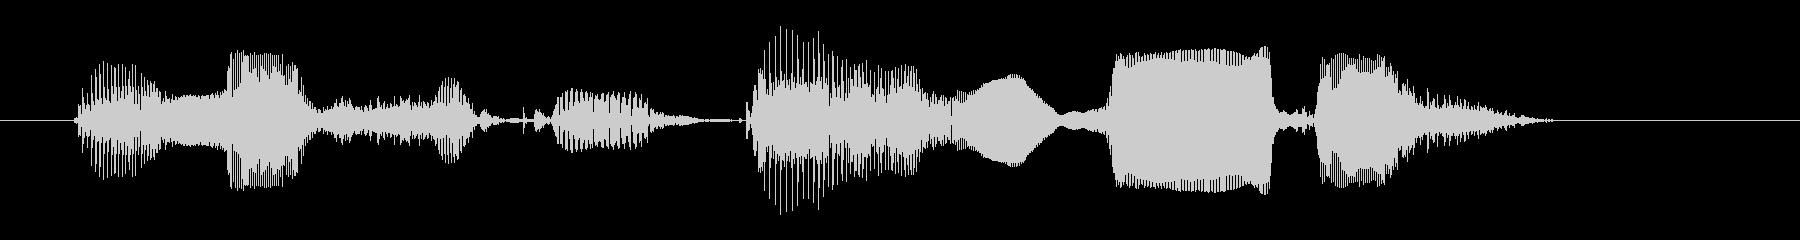 download now. girl's unreproduced waveform